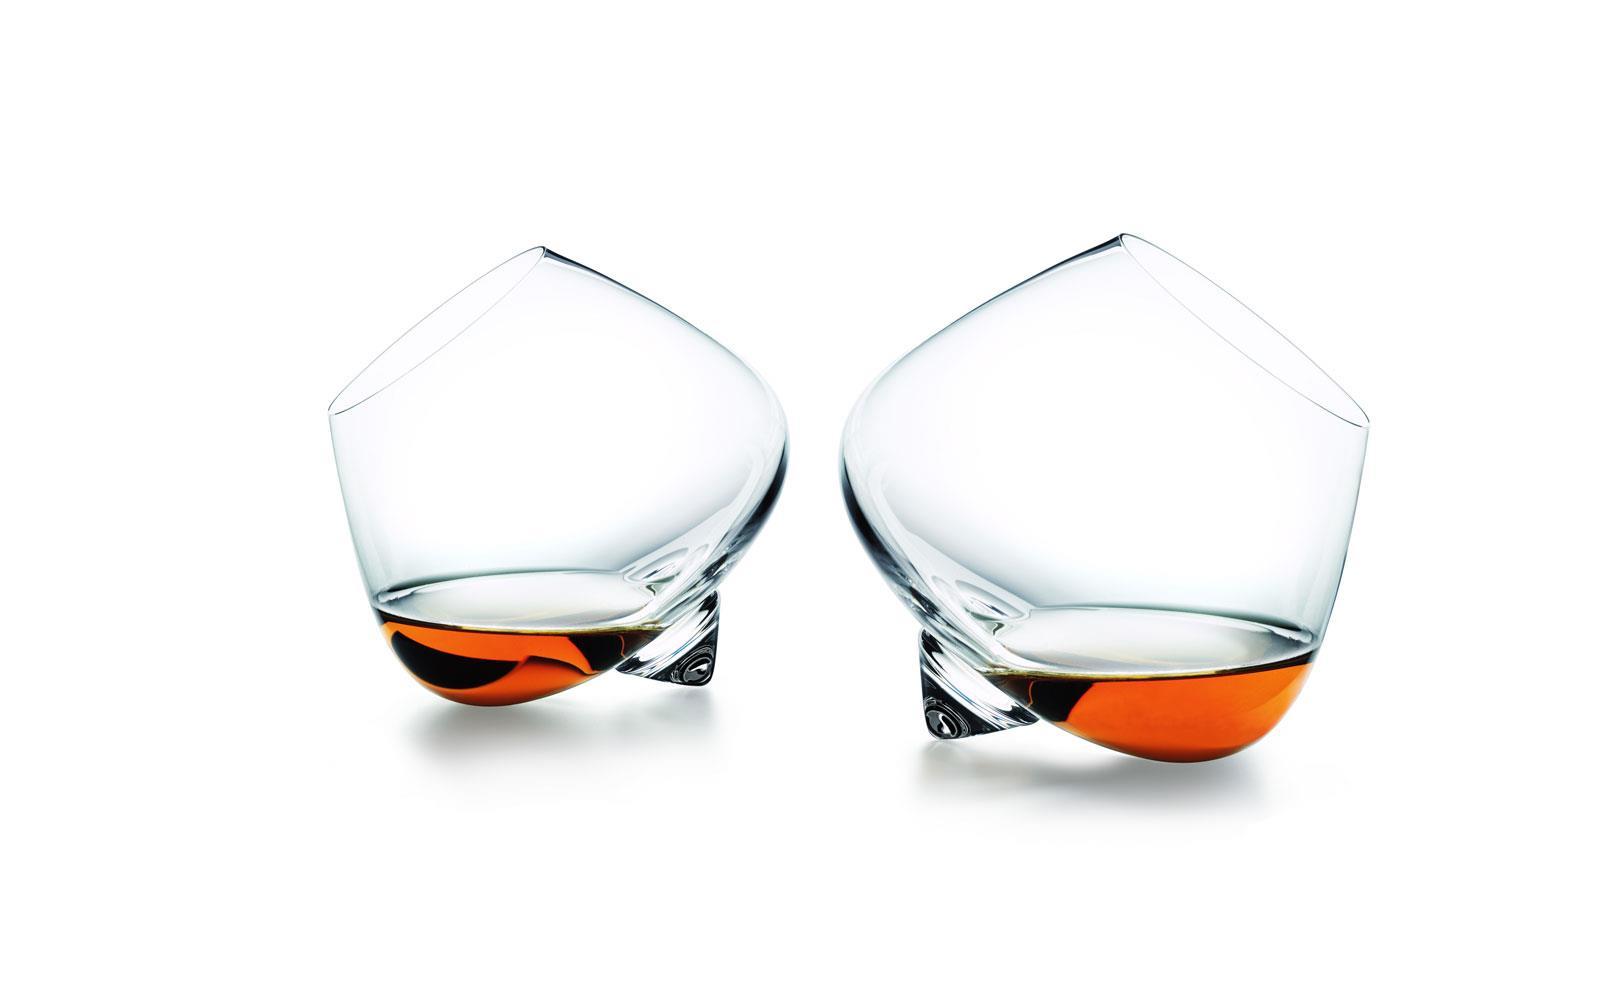 normann copenhagen whiskyglas